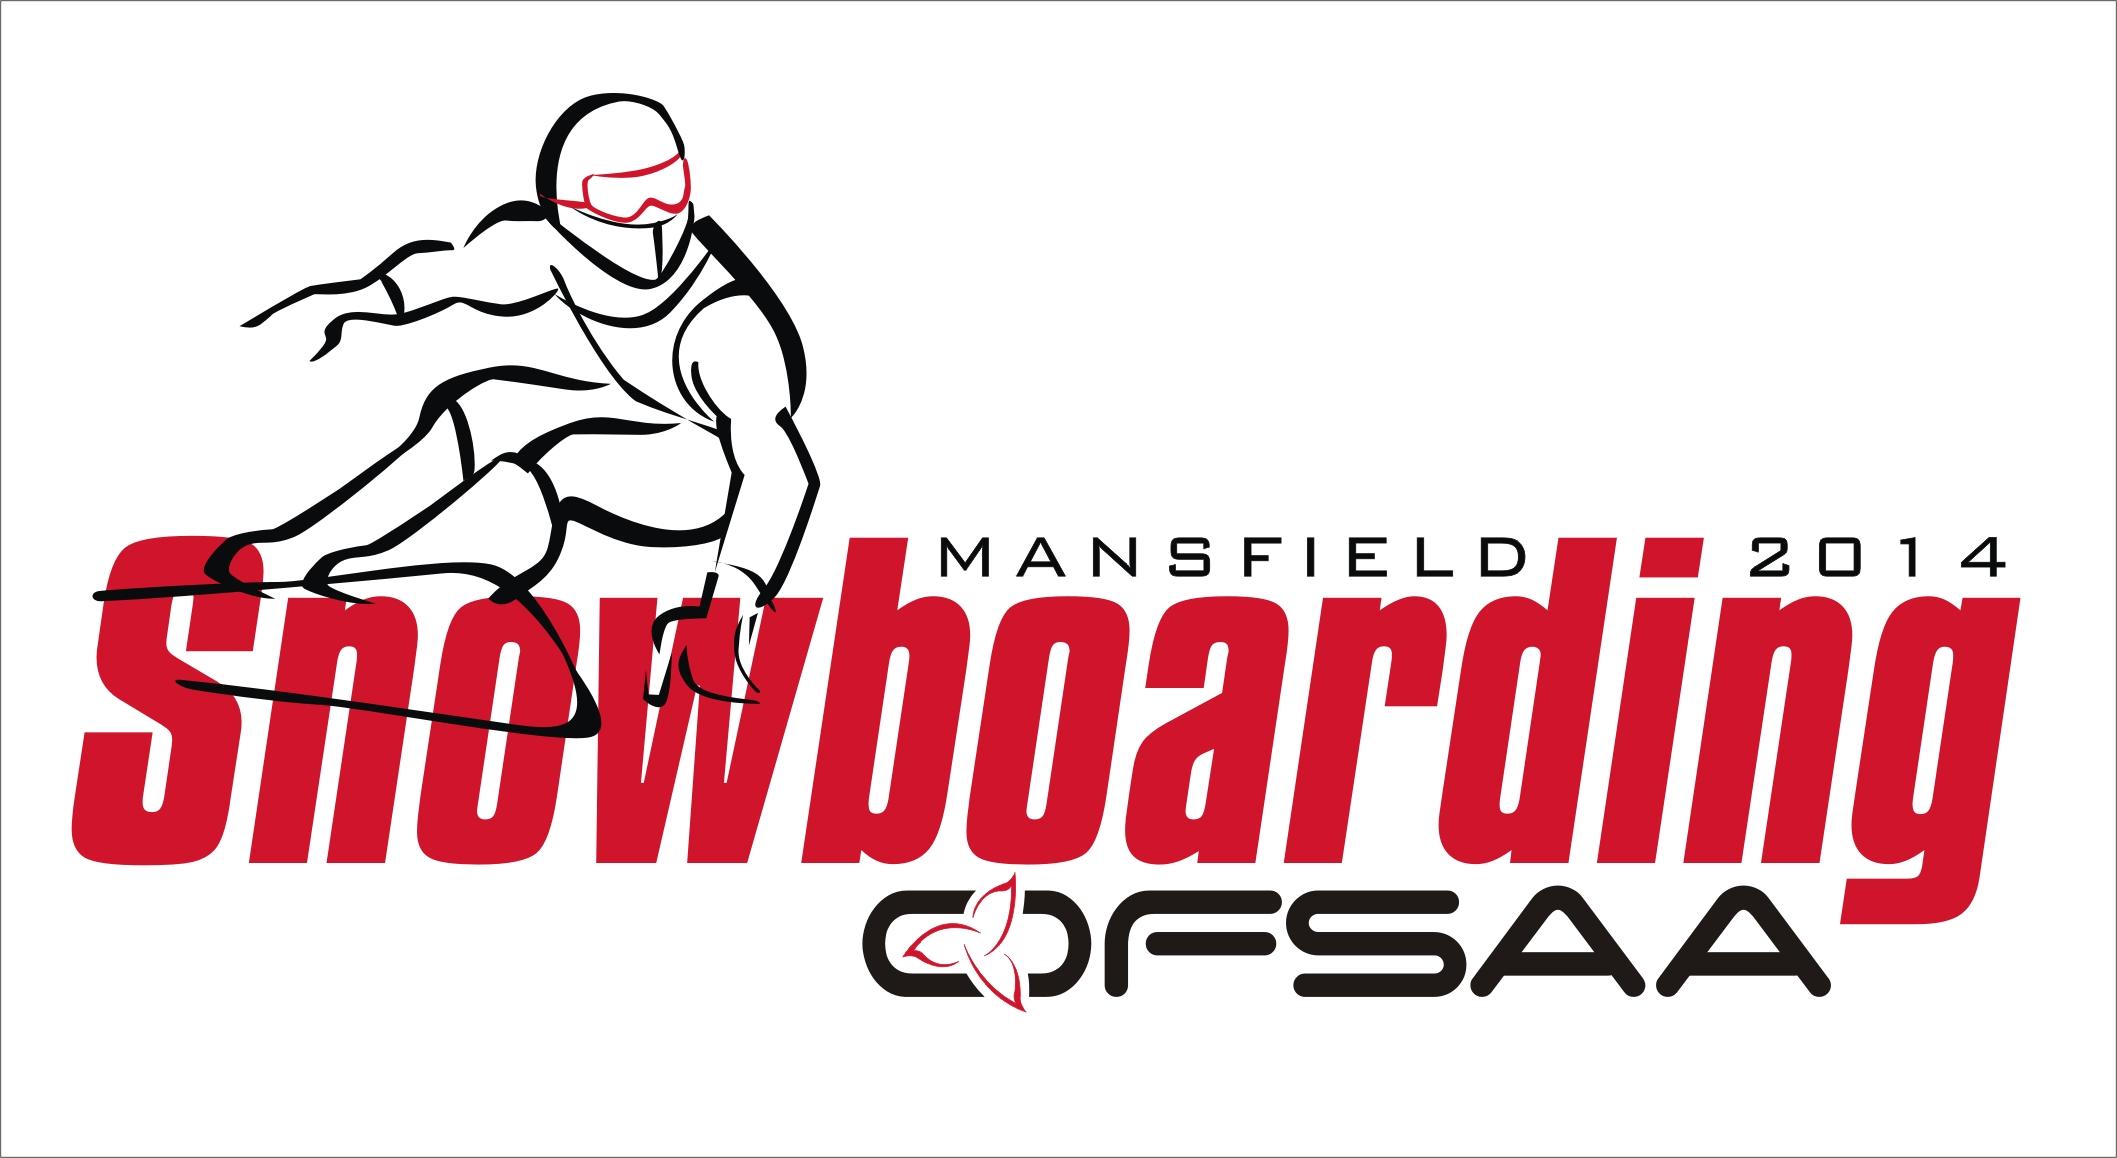 Snowboarding logo.jpg